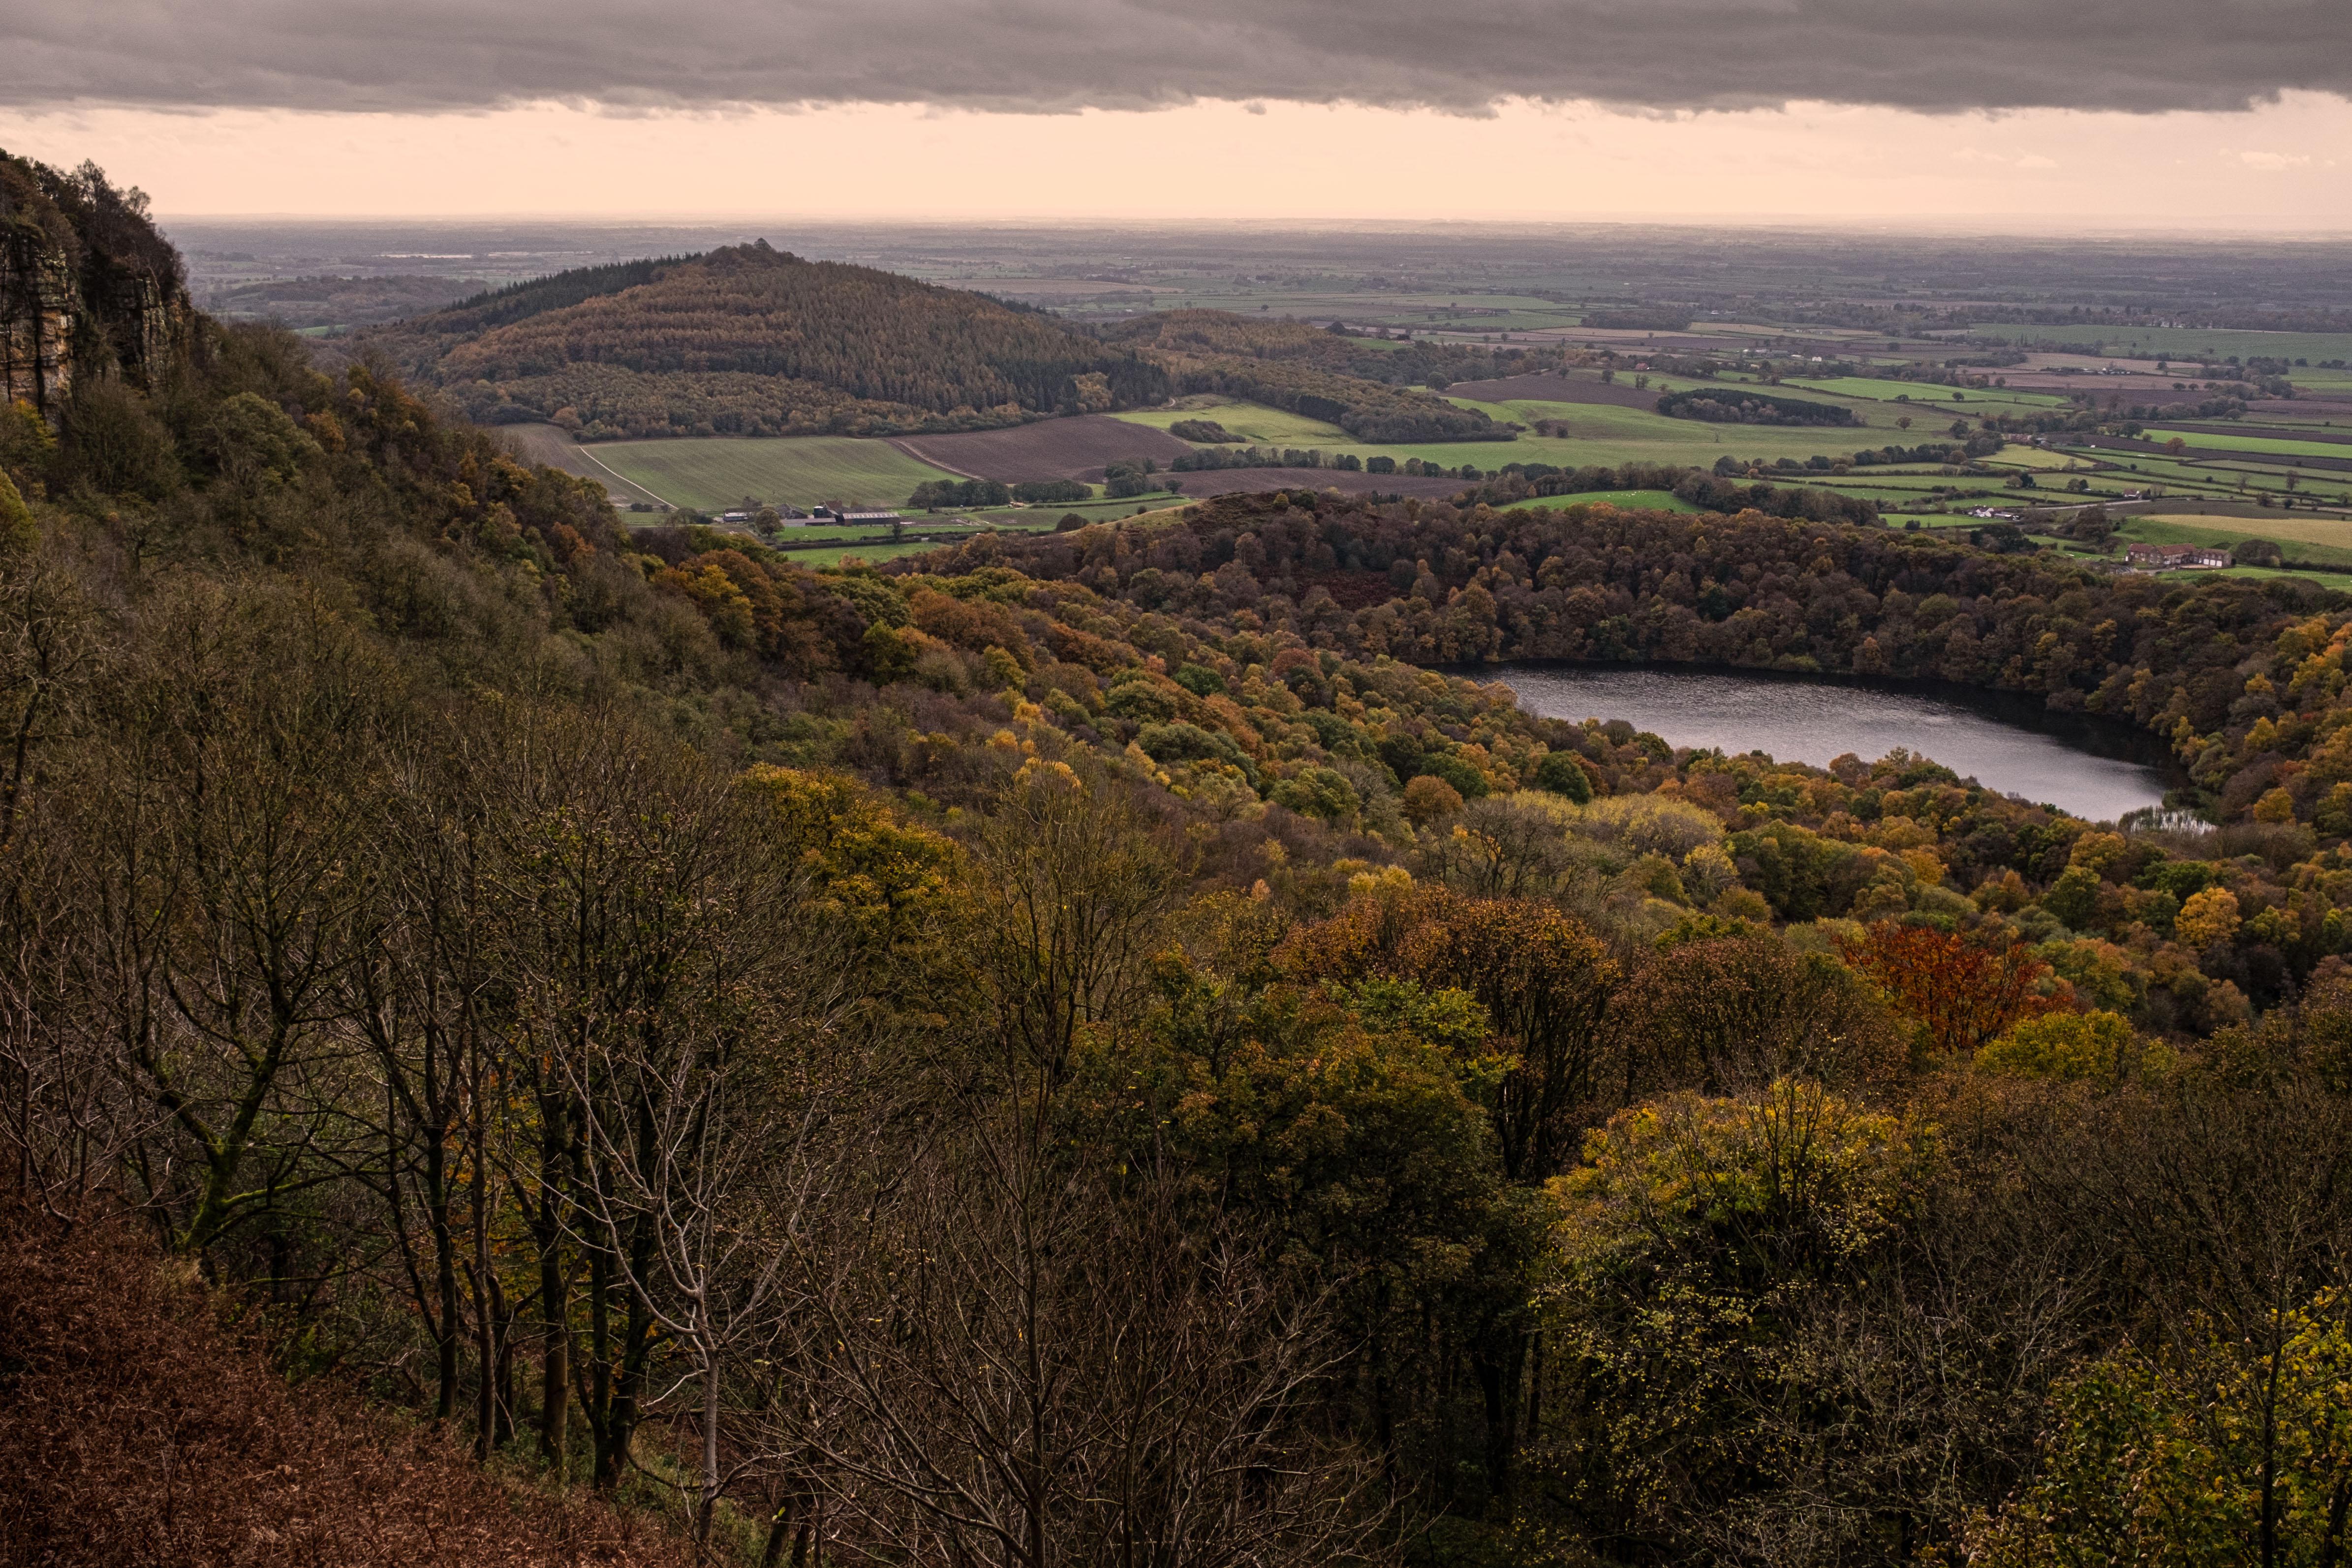 autumn at gormire lake - nick.